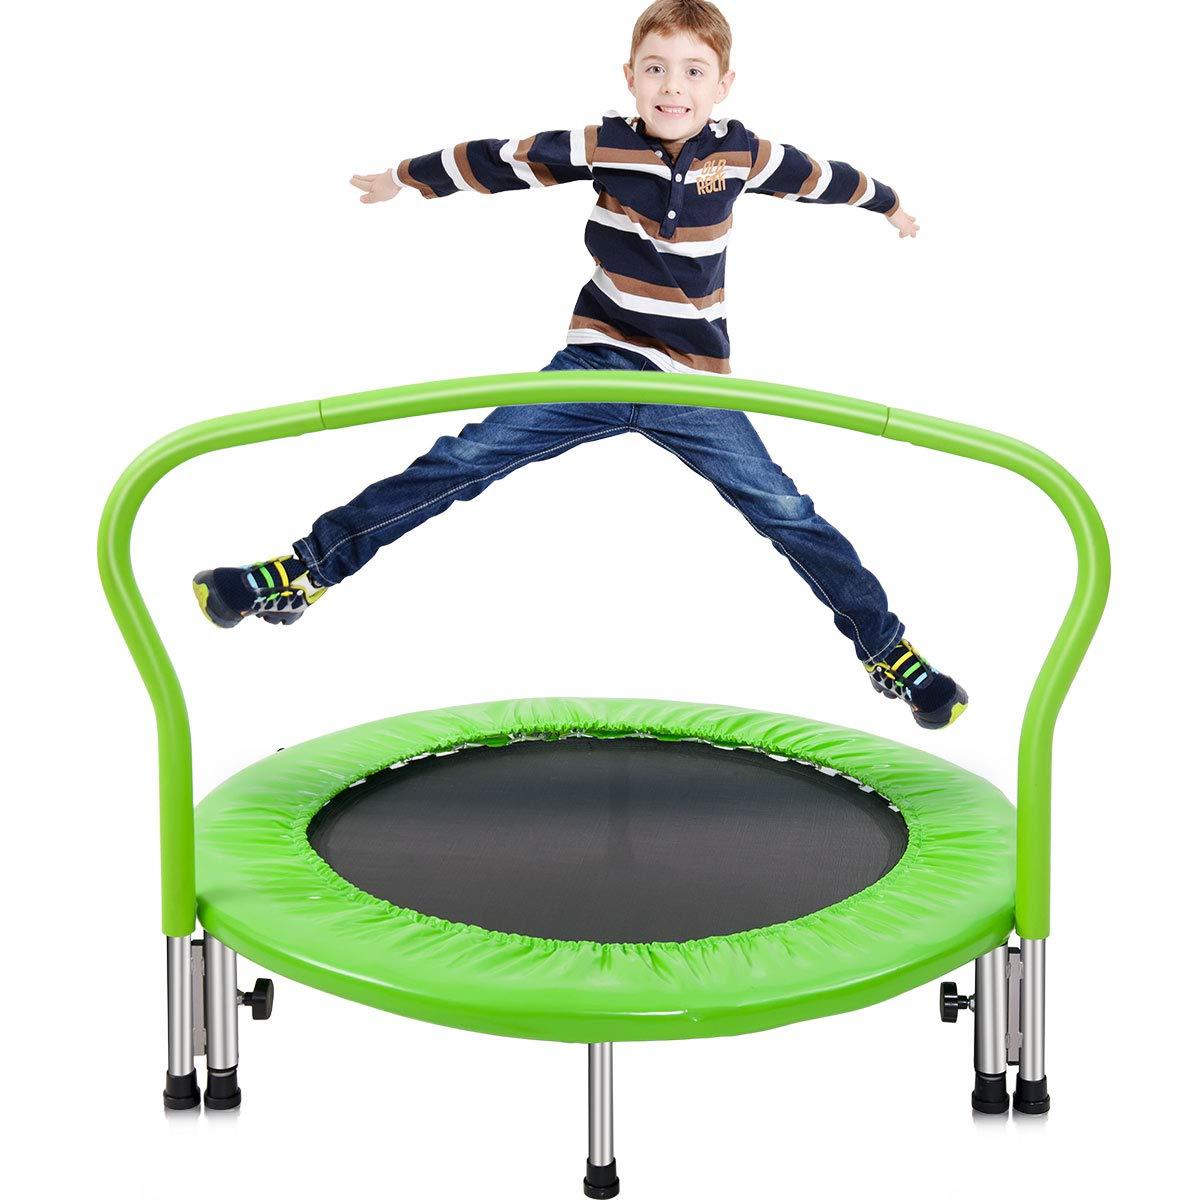 Merax 36'' Kid's Mini Exercise Trampoline Portable Trampoline Toddler Trampoline with Handrail (Green.Pad)